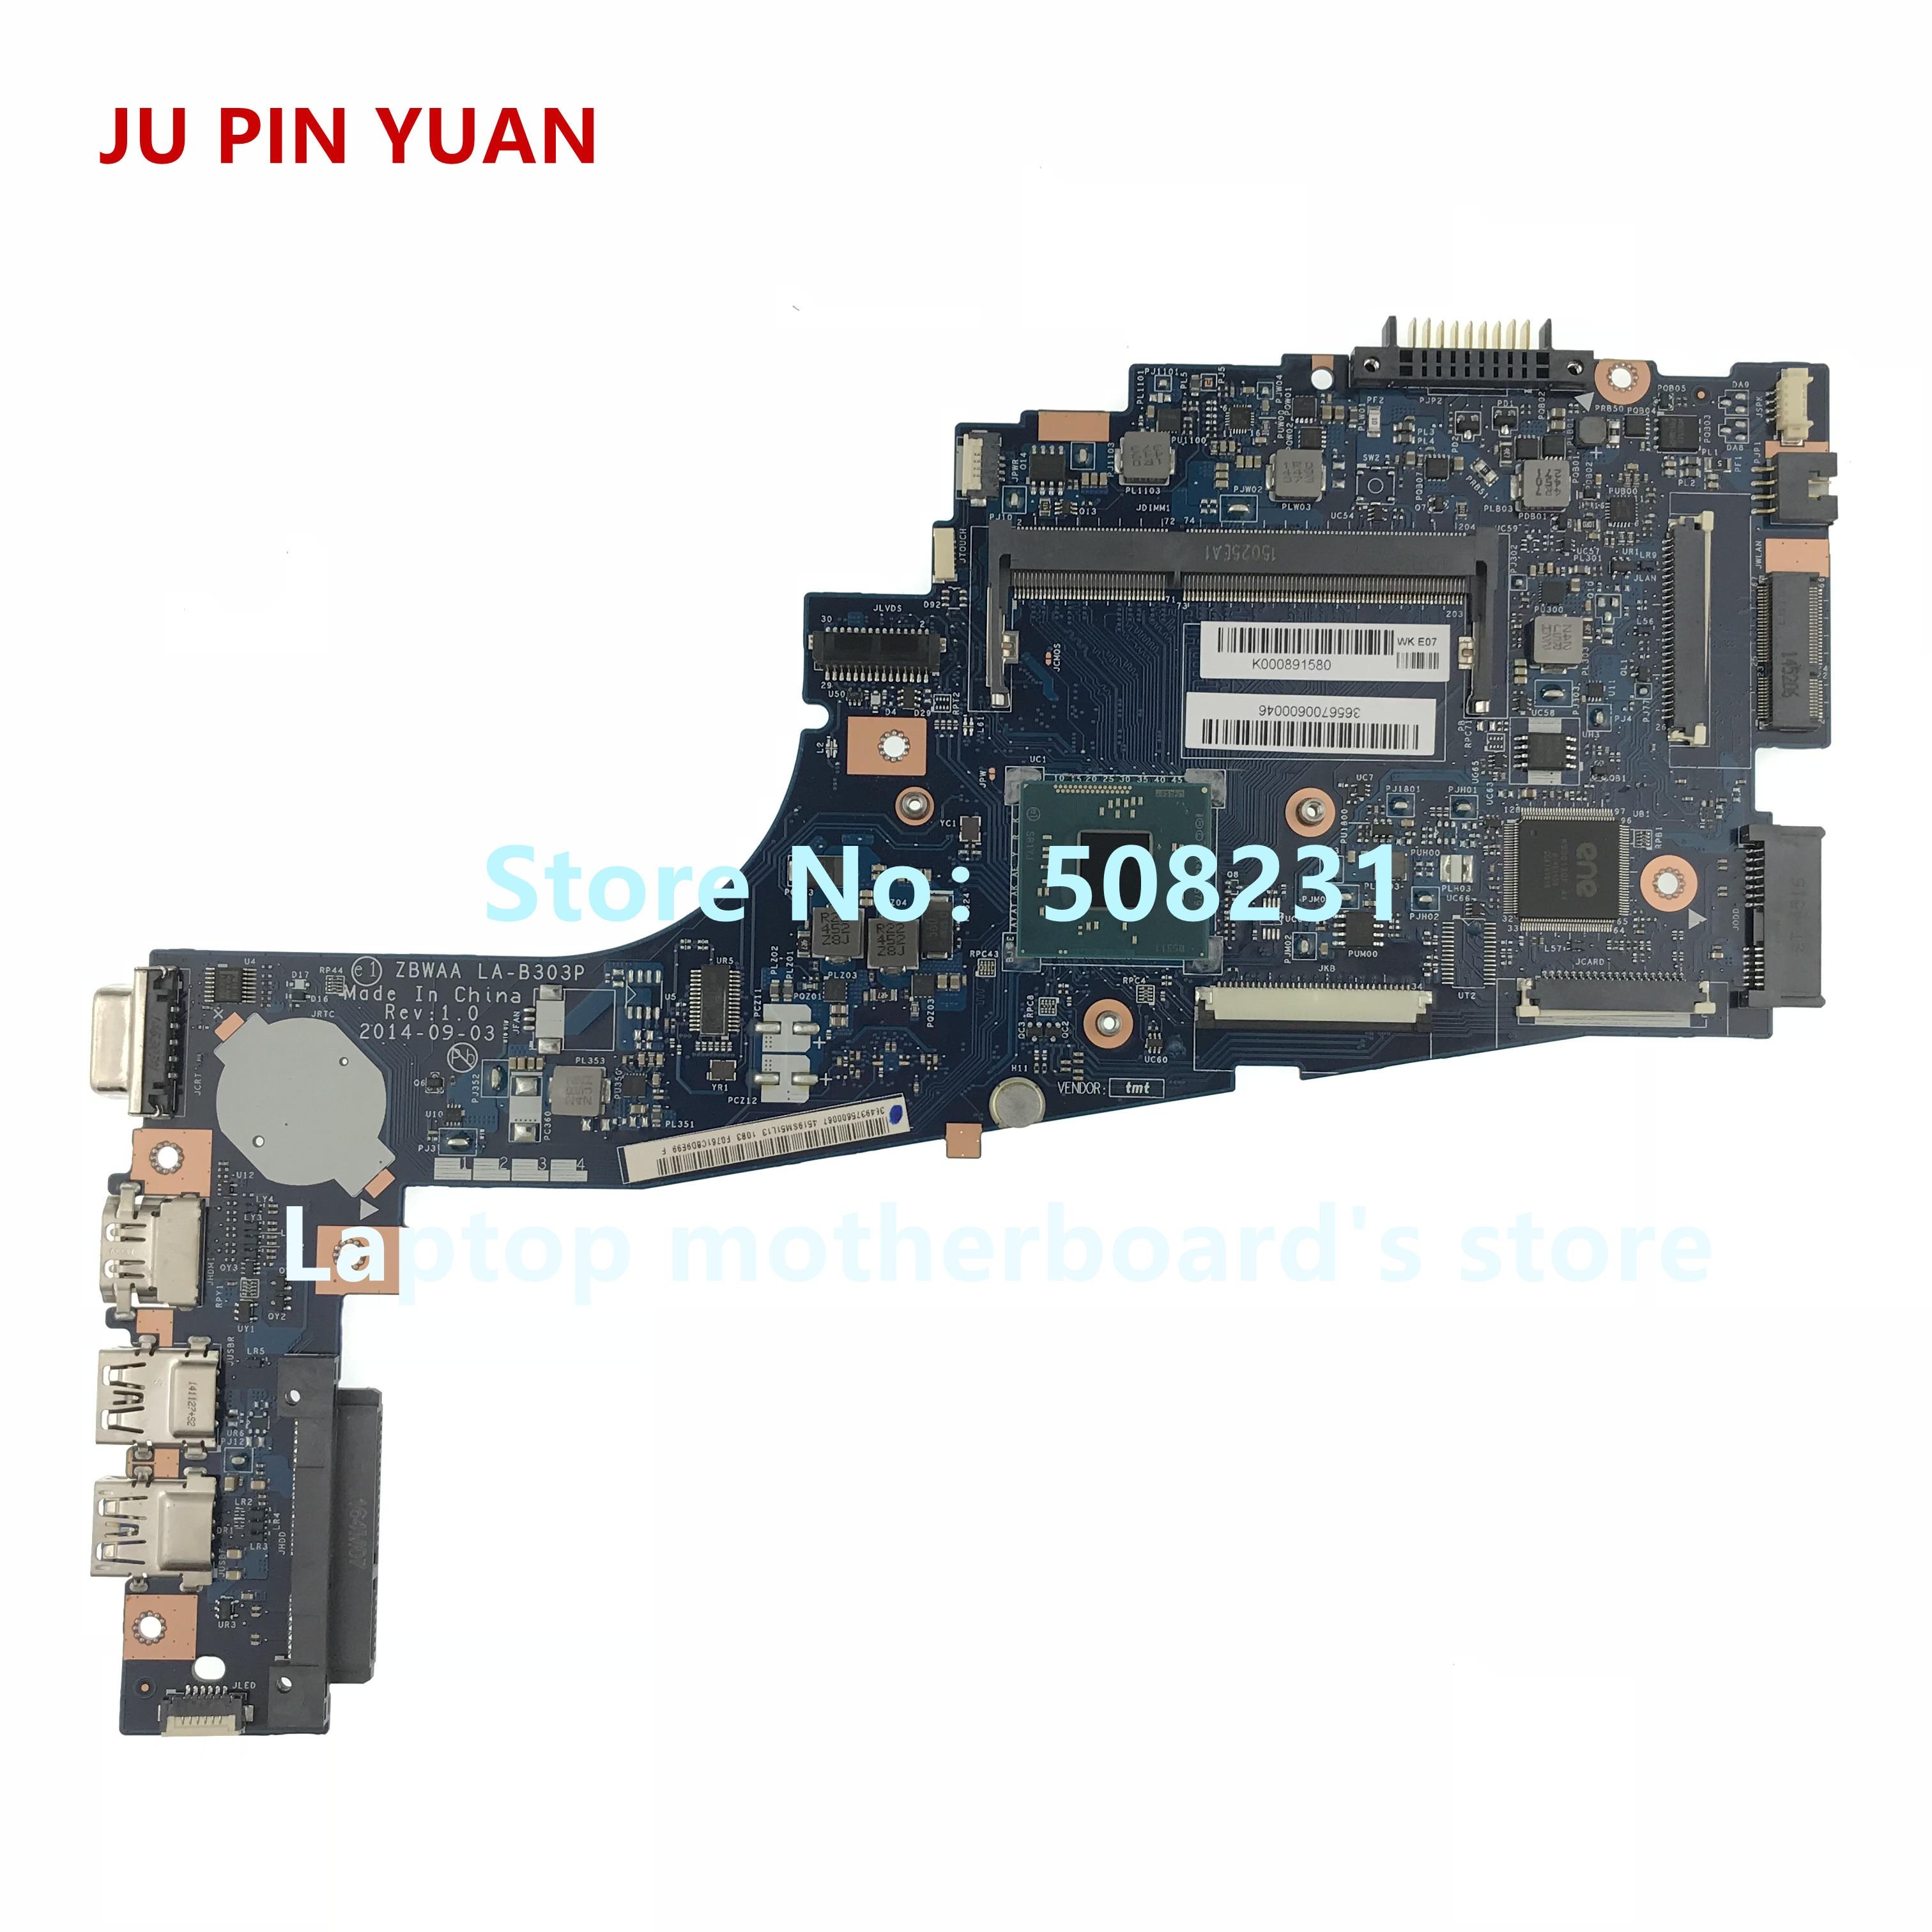 JU PIN YUAN ZBWAA LA-B303P Laptop Motherboard For Toshiba Satellite C55-B5202 C55-B Mainboard With N2840 Cpu